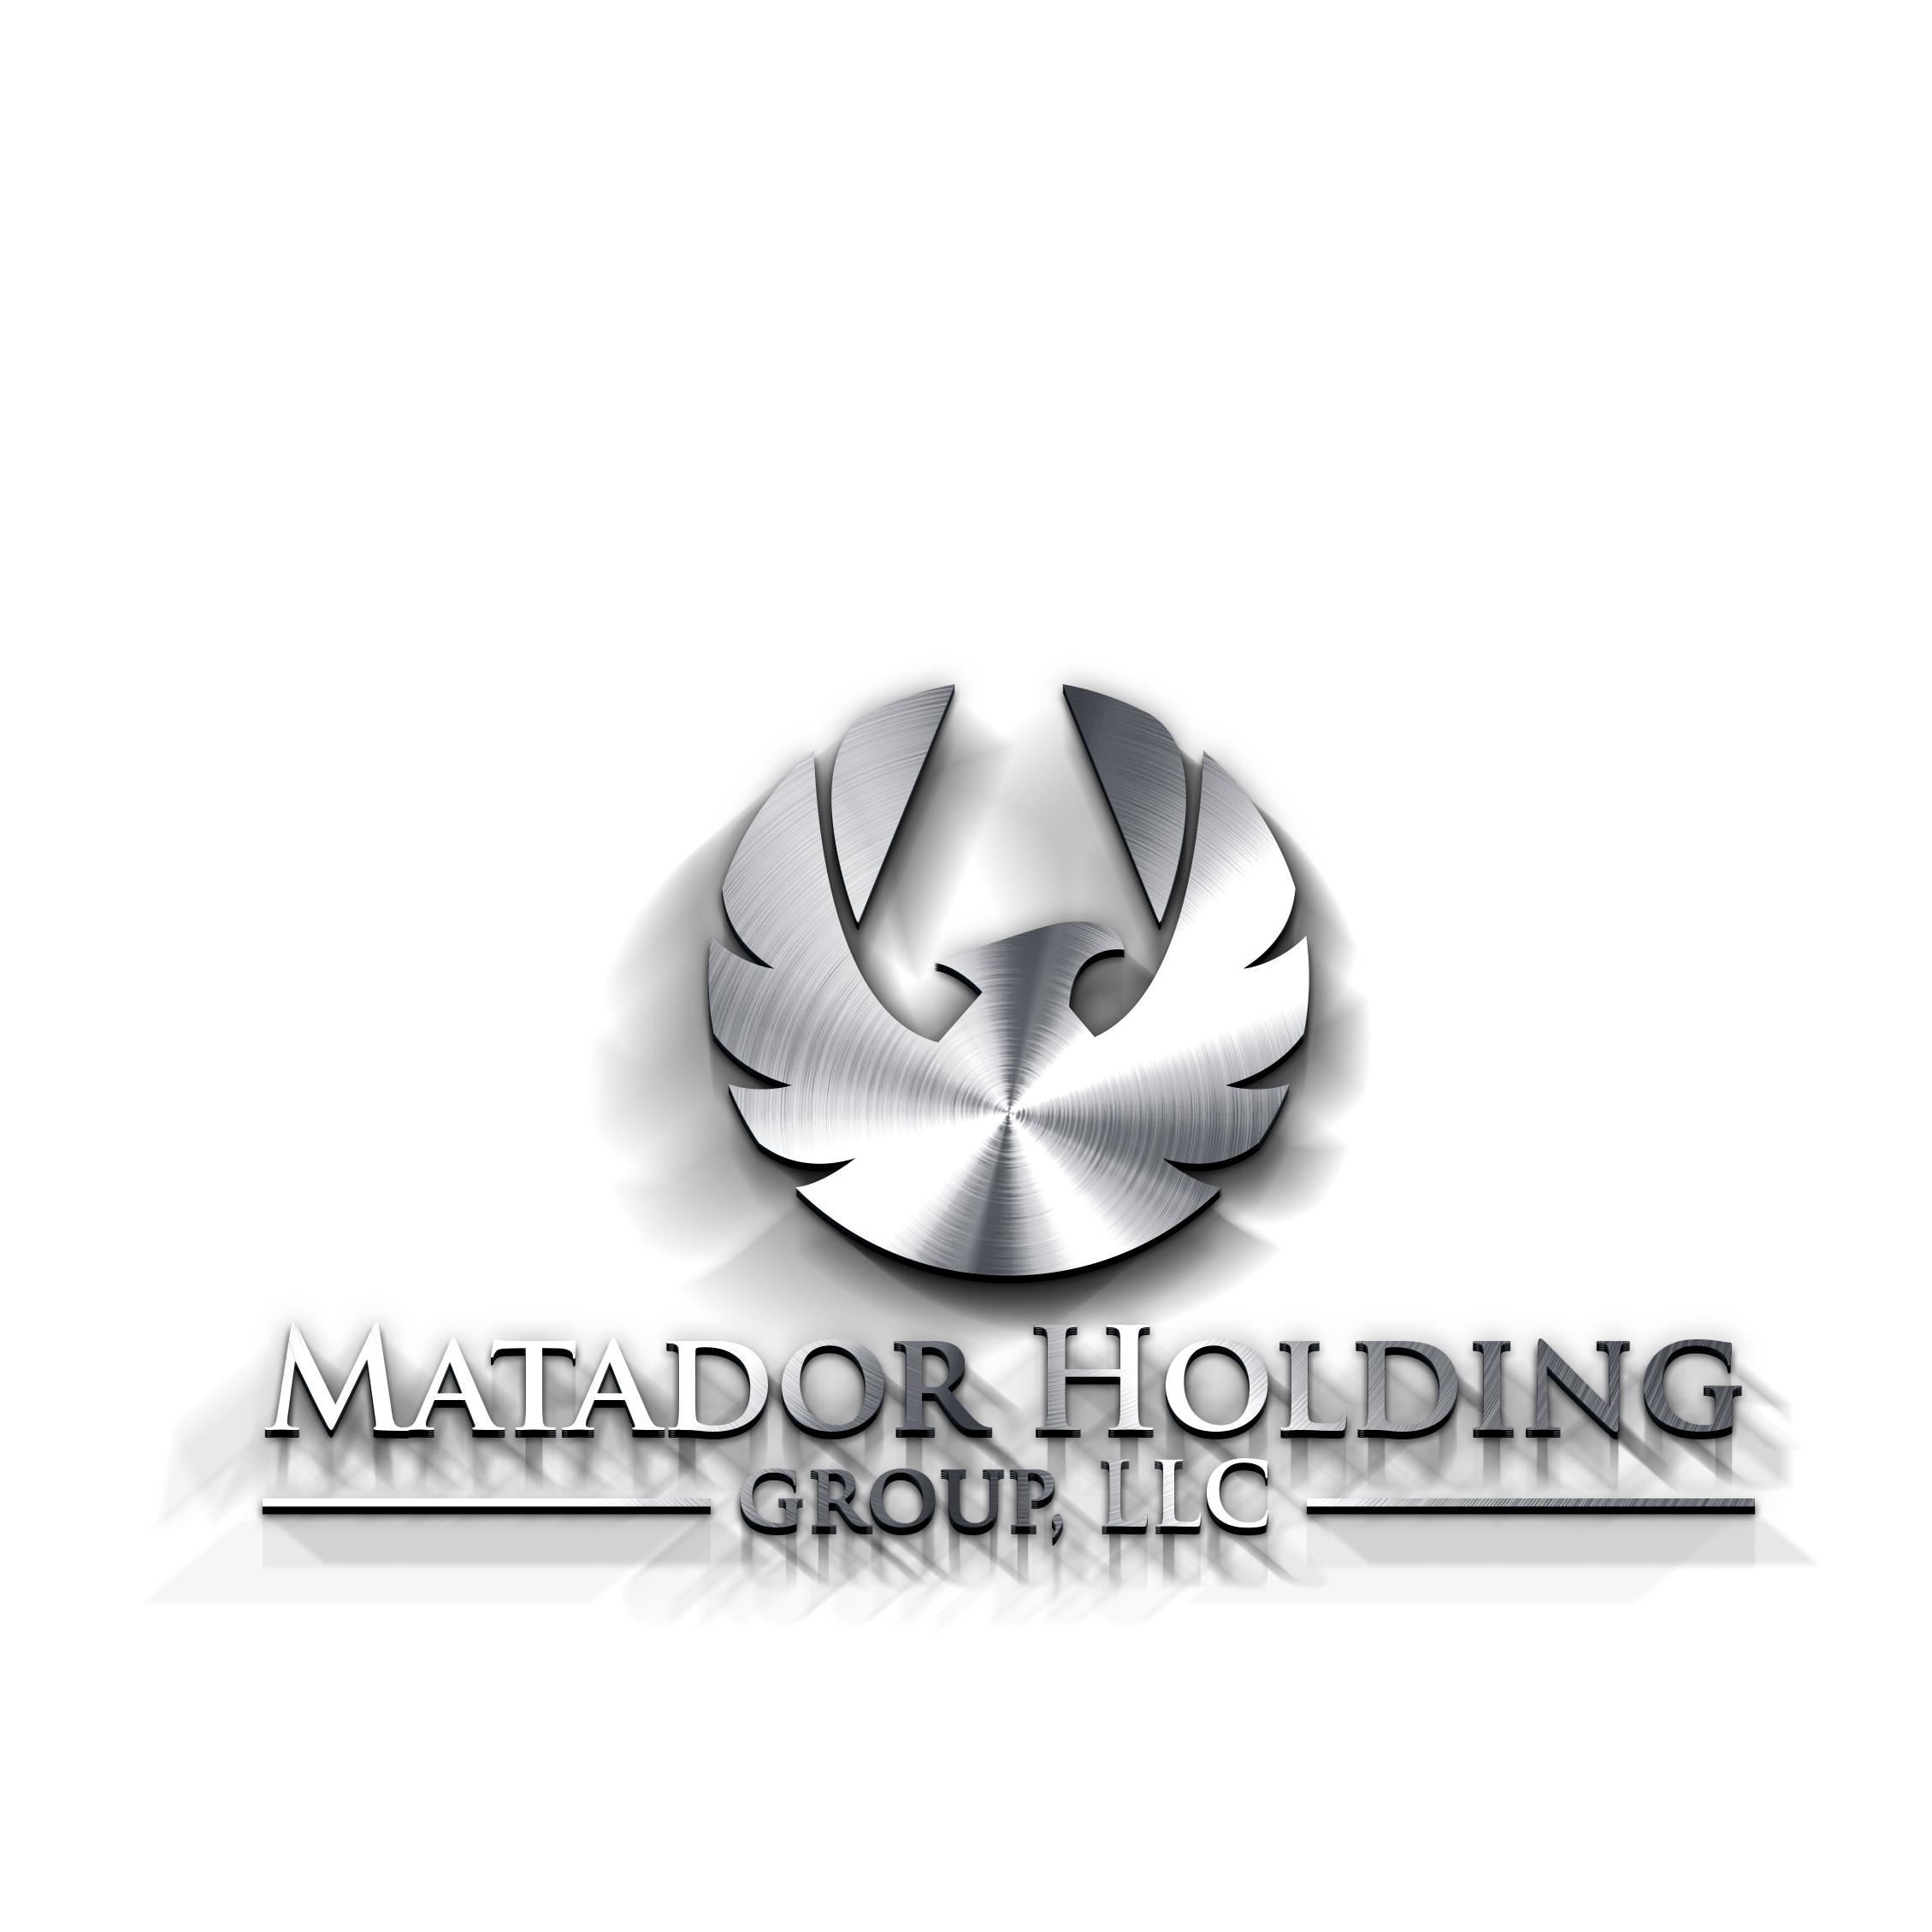 Matador Holding Group, LLC